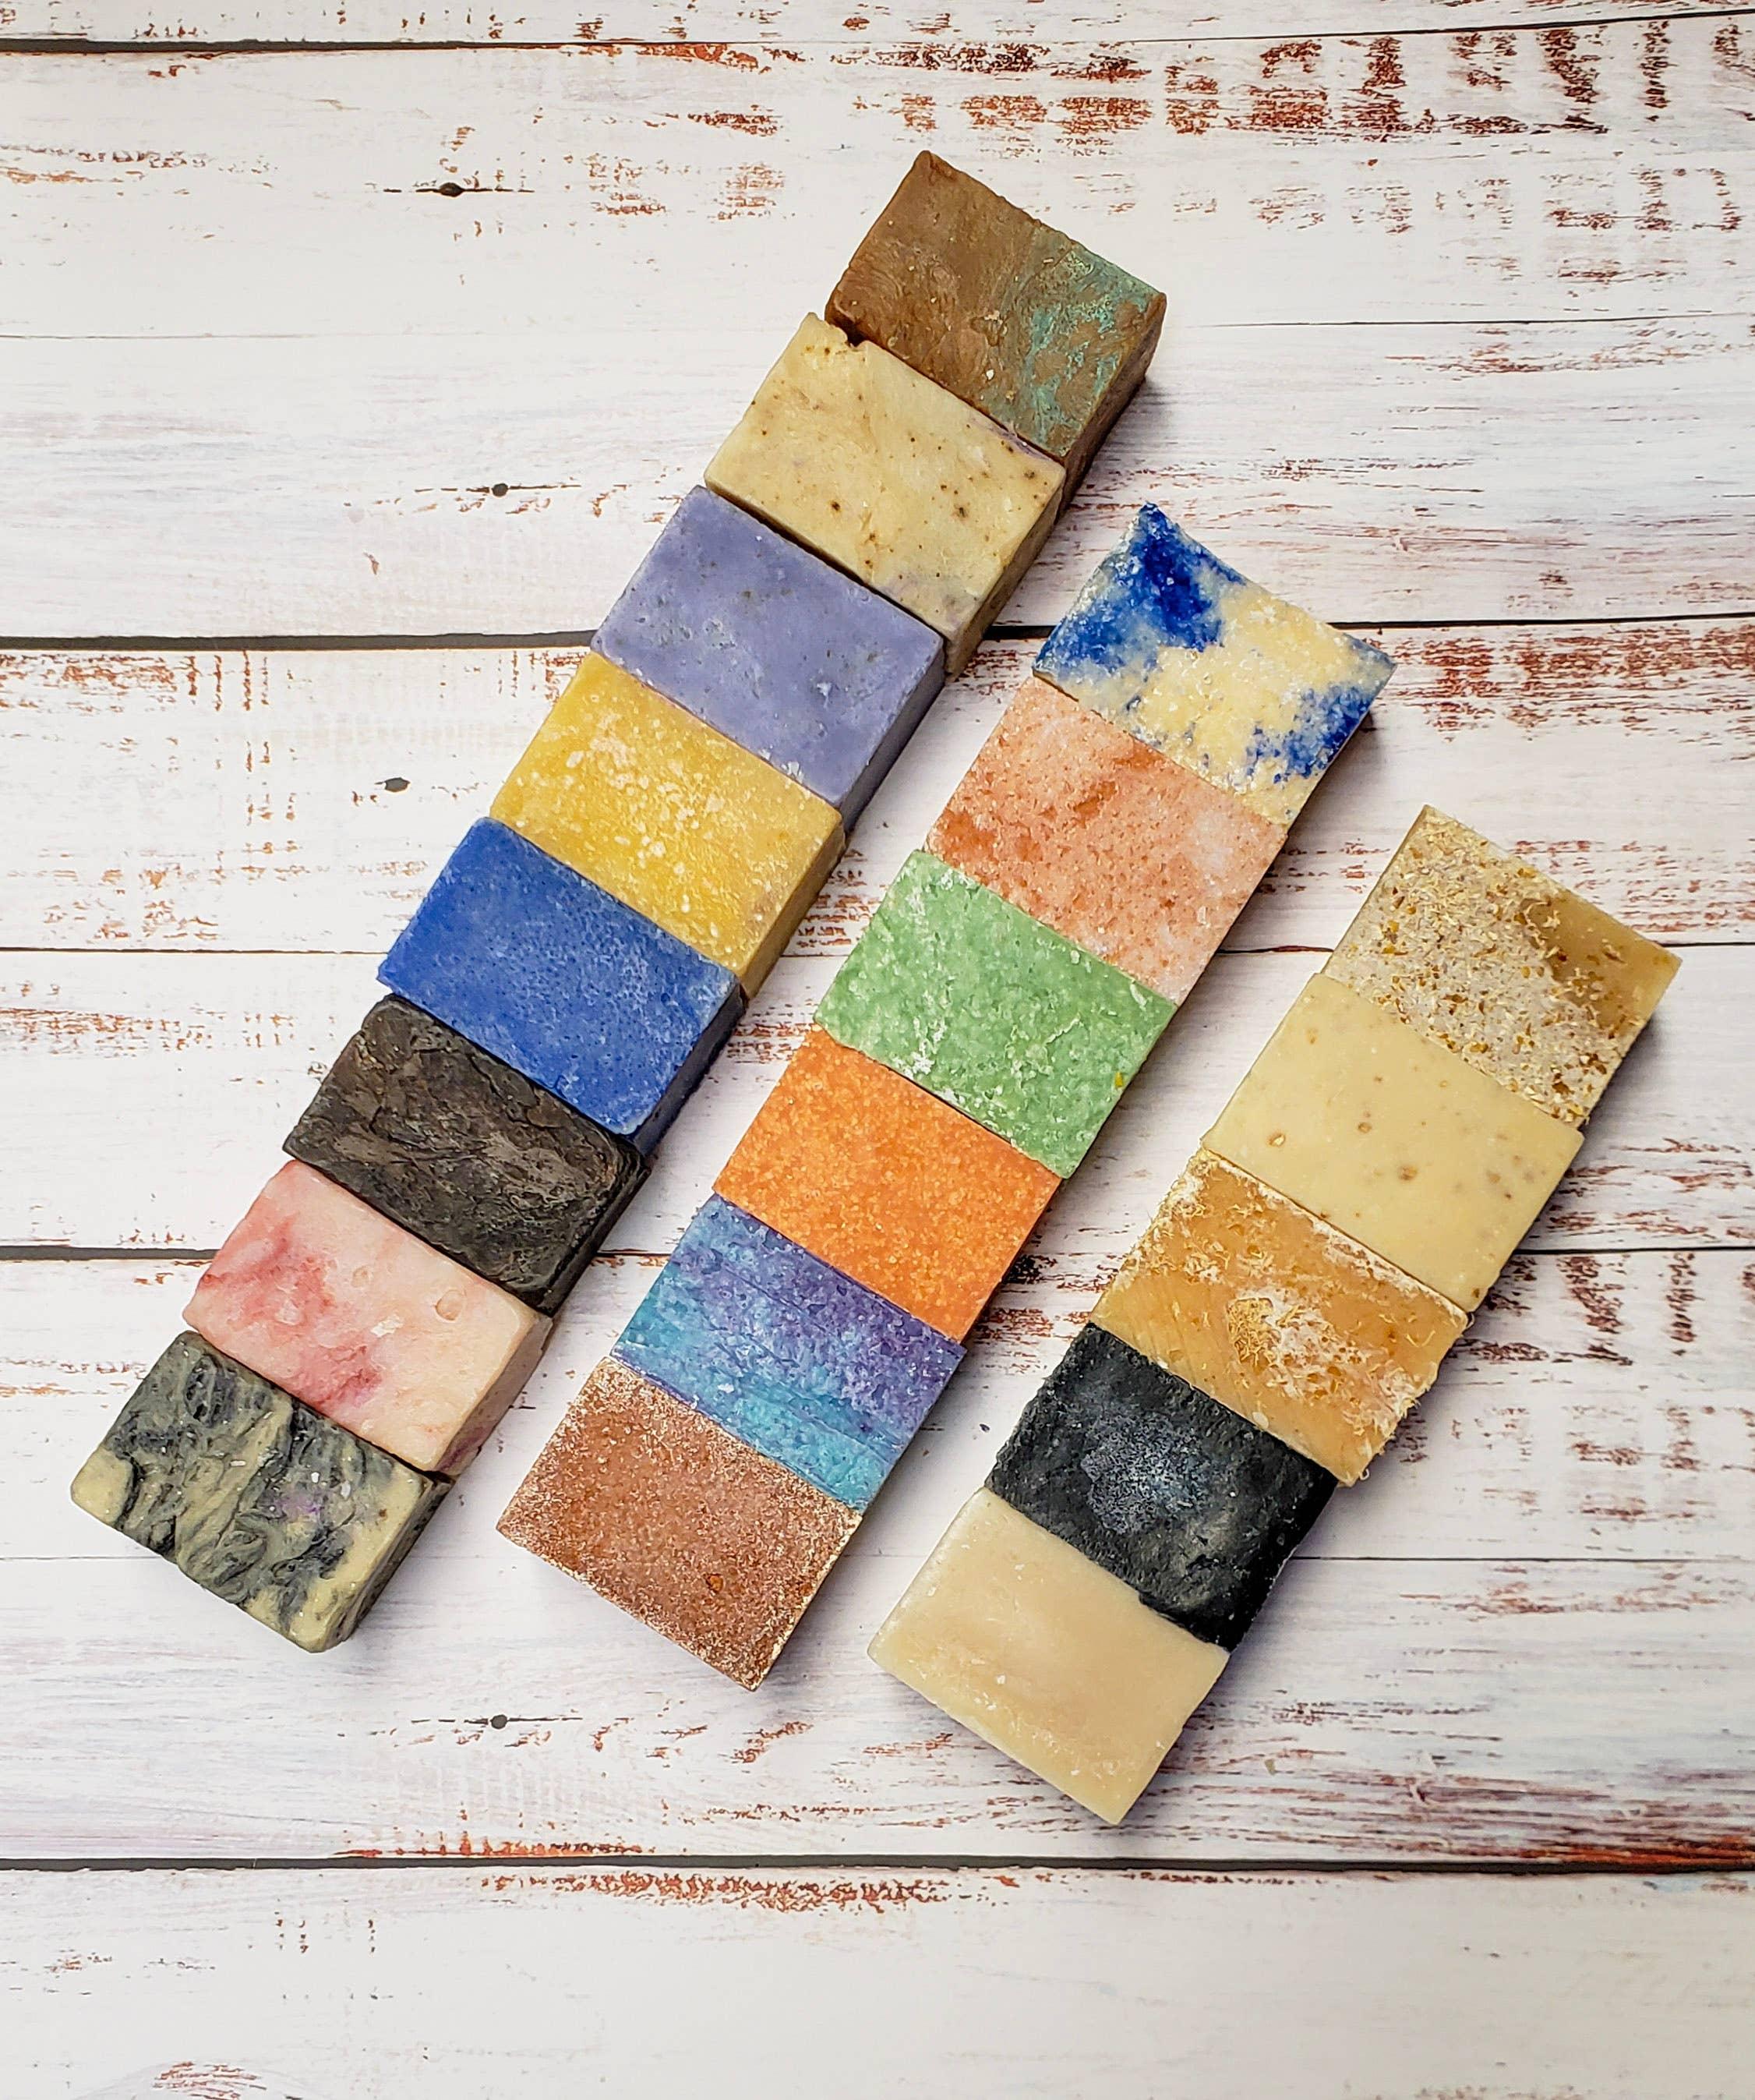 Evolve - Bulk Raw Soaps - Specialty Soaps | Trada Marketplace